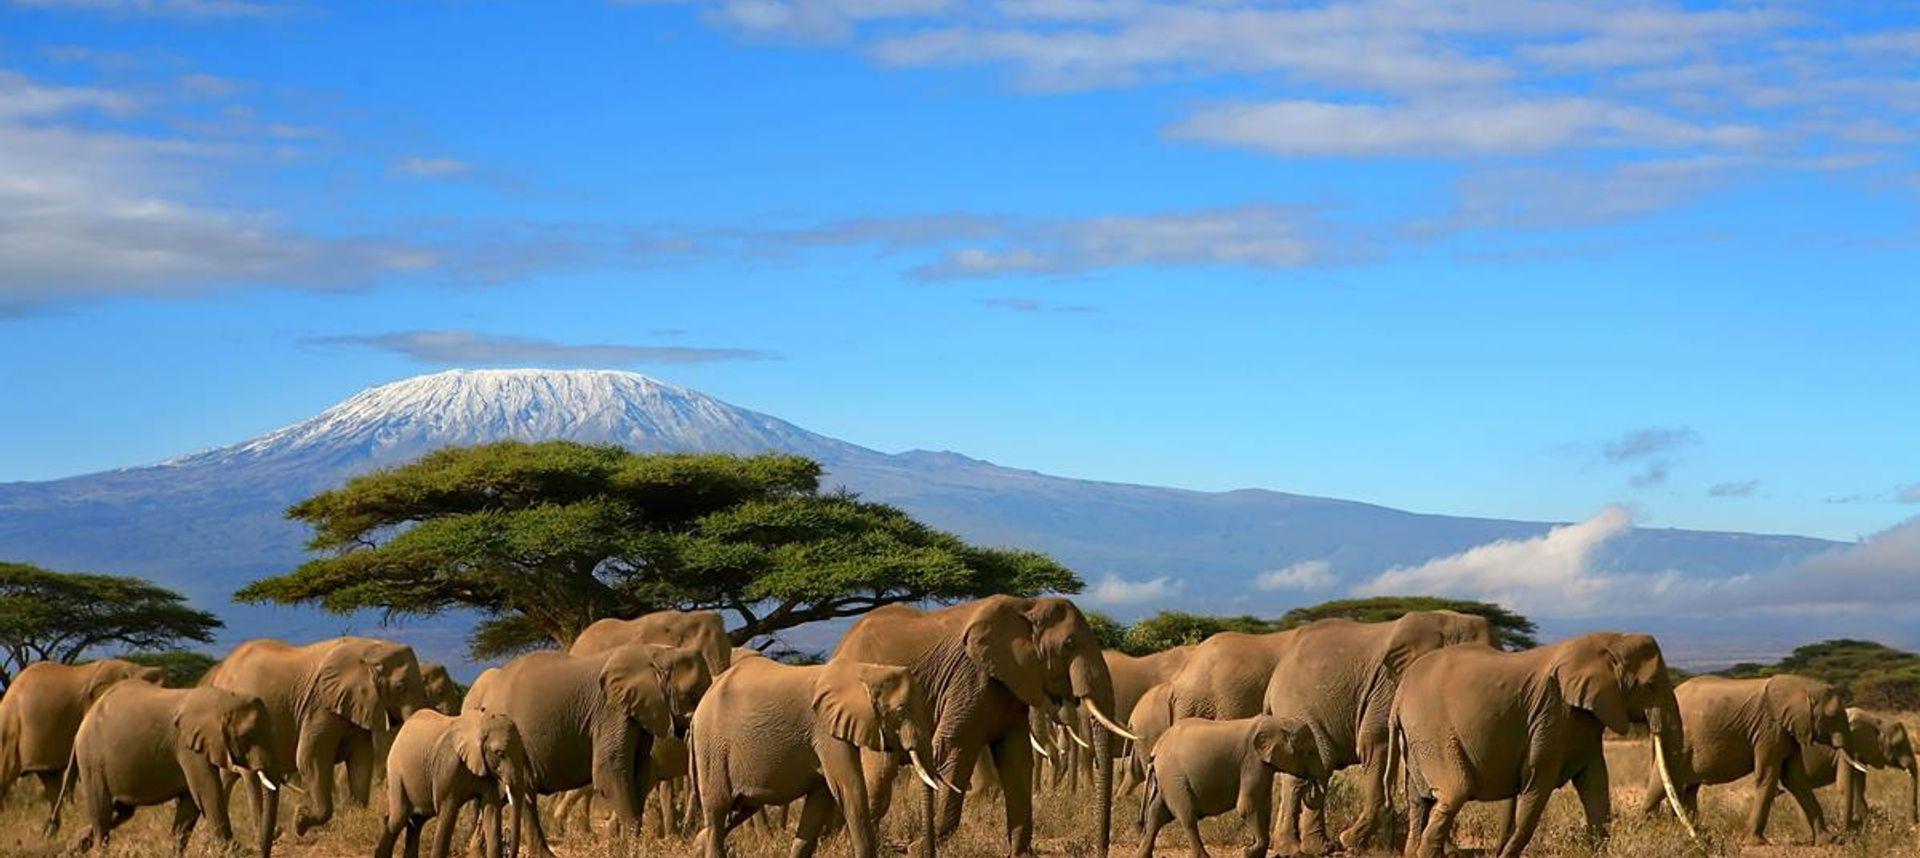 Kilimanjaro (Sarah Baxter)